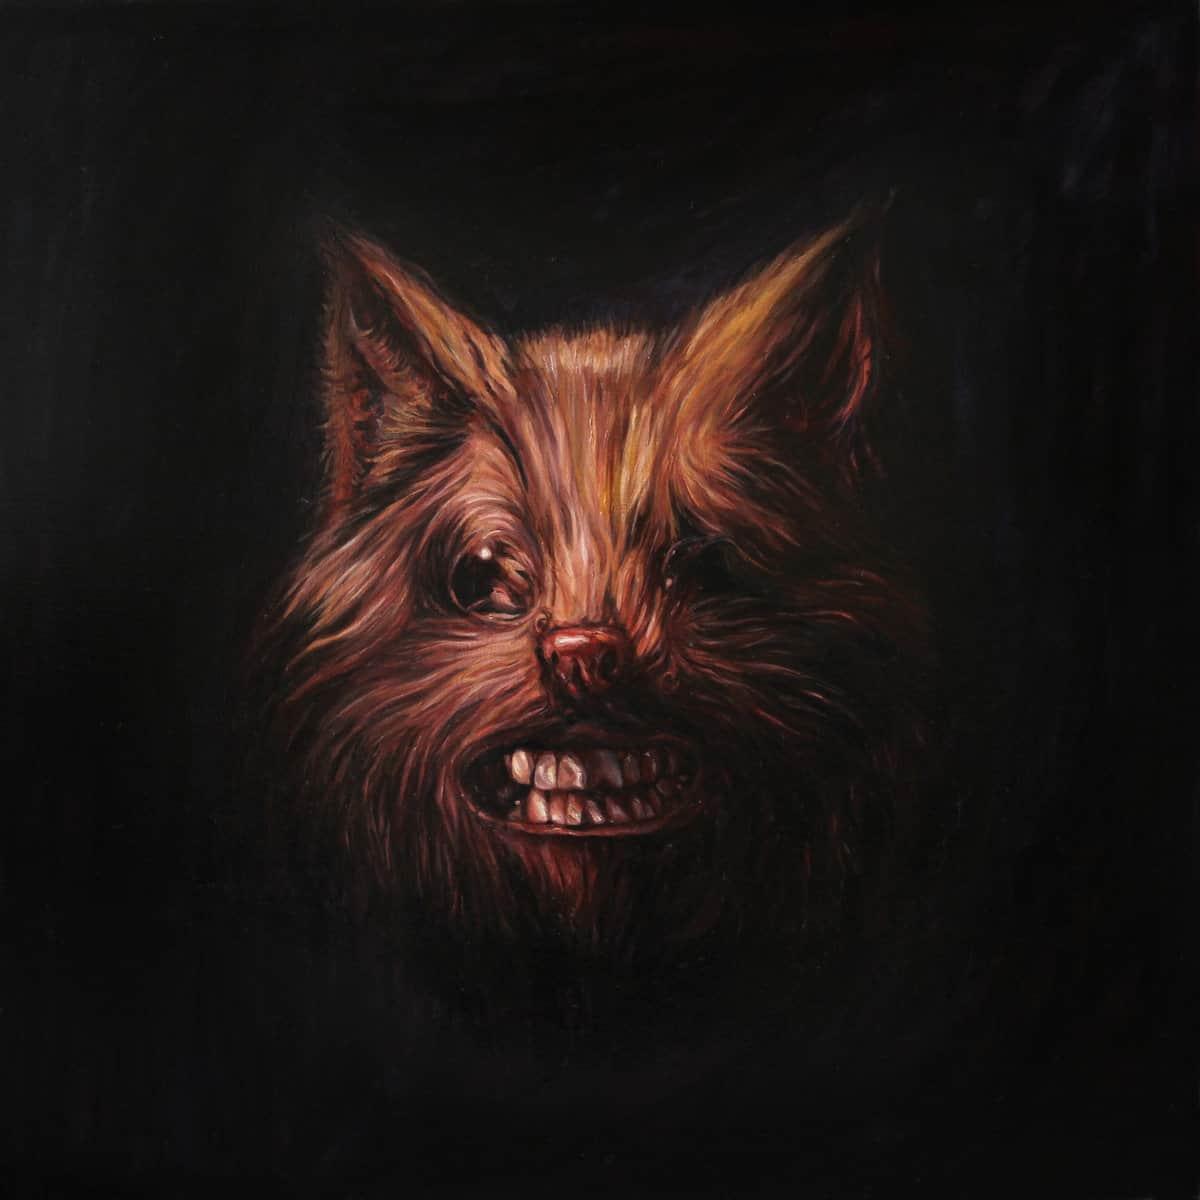 SWANS: The Seer. Vinyl & CD. Norman Records UK